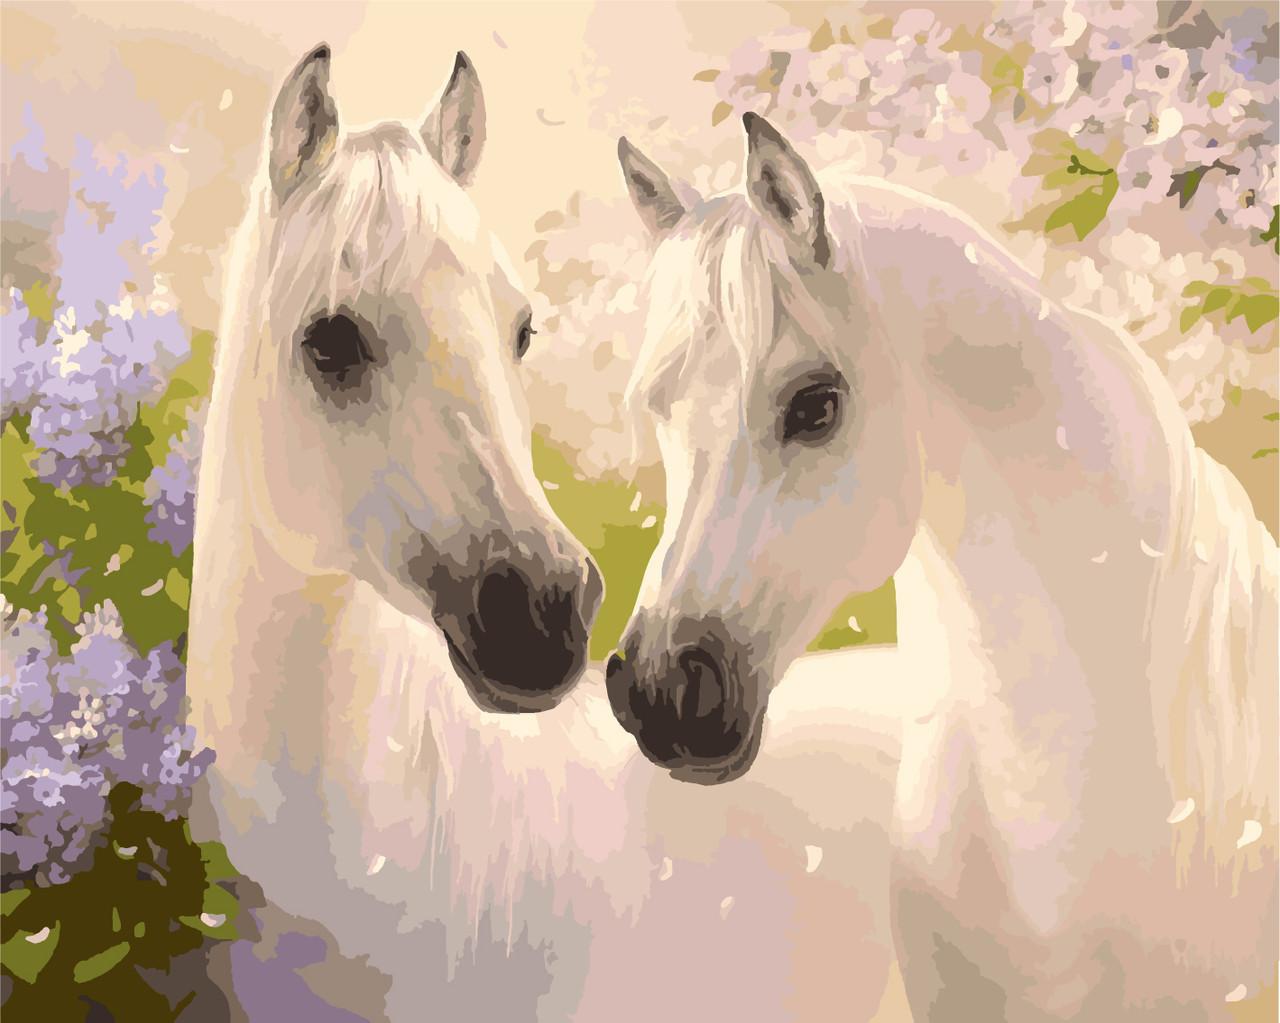 Картина по номерам Пара лошадей, 40x50 см., Идейка